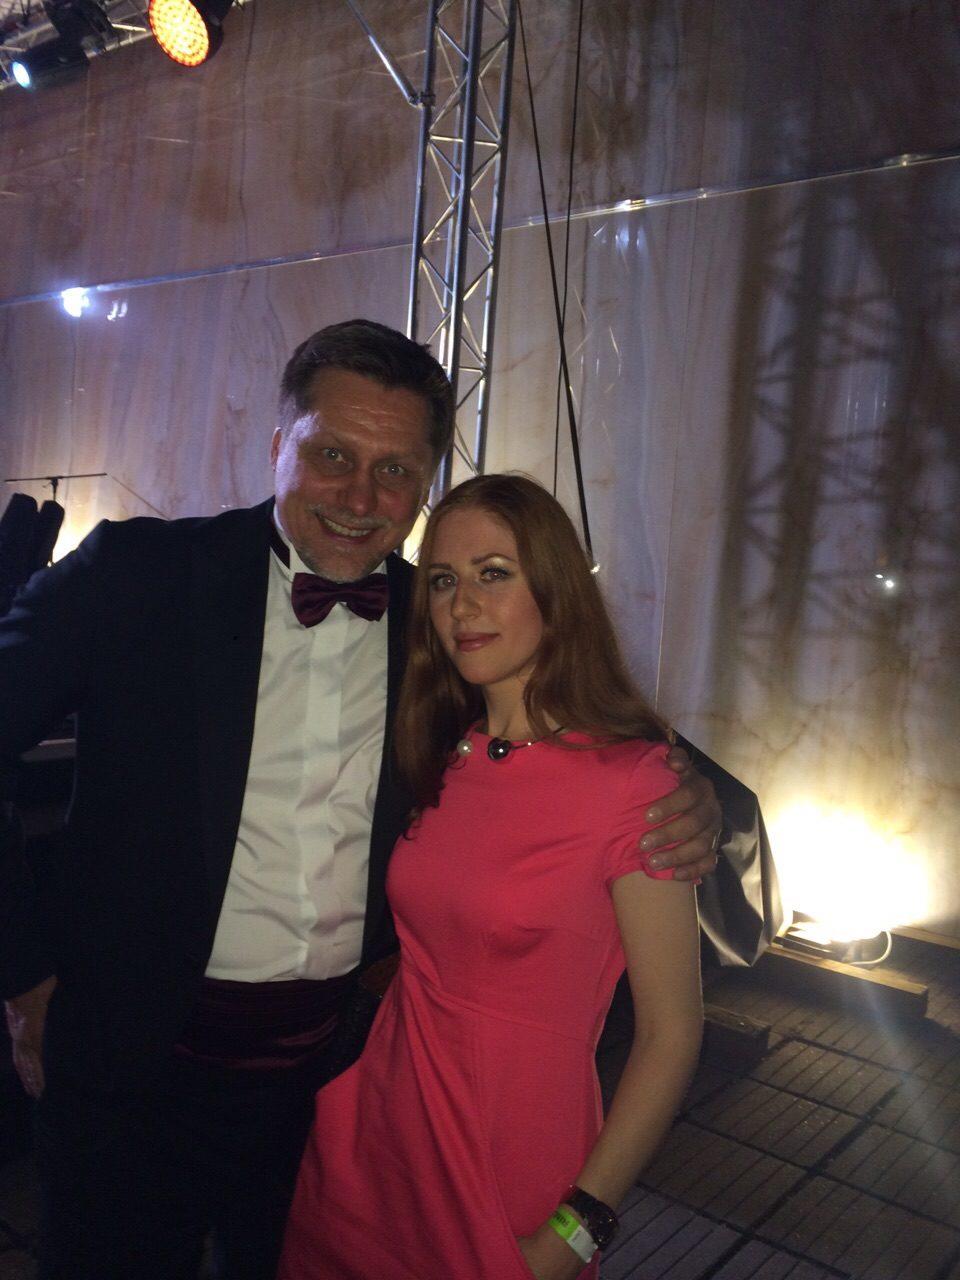 Я и Гедиминас Таранда  ЦДХ  АРХ- Москва